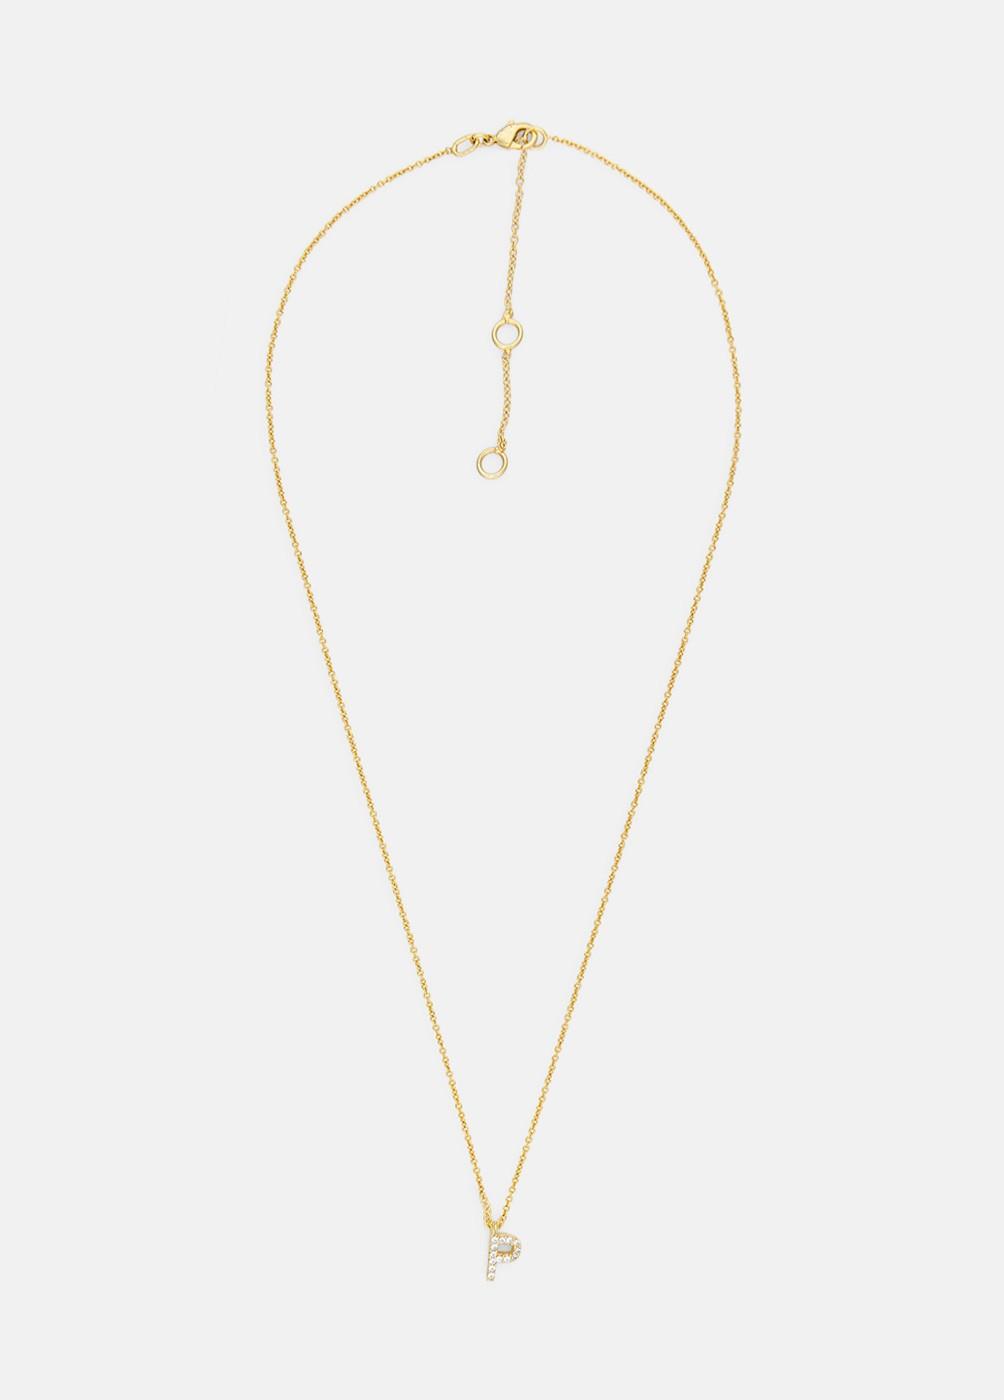 eb4c51c292a6 Collar Inicial Circonitas